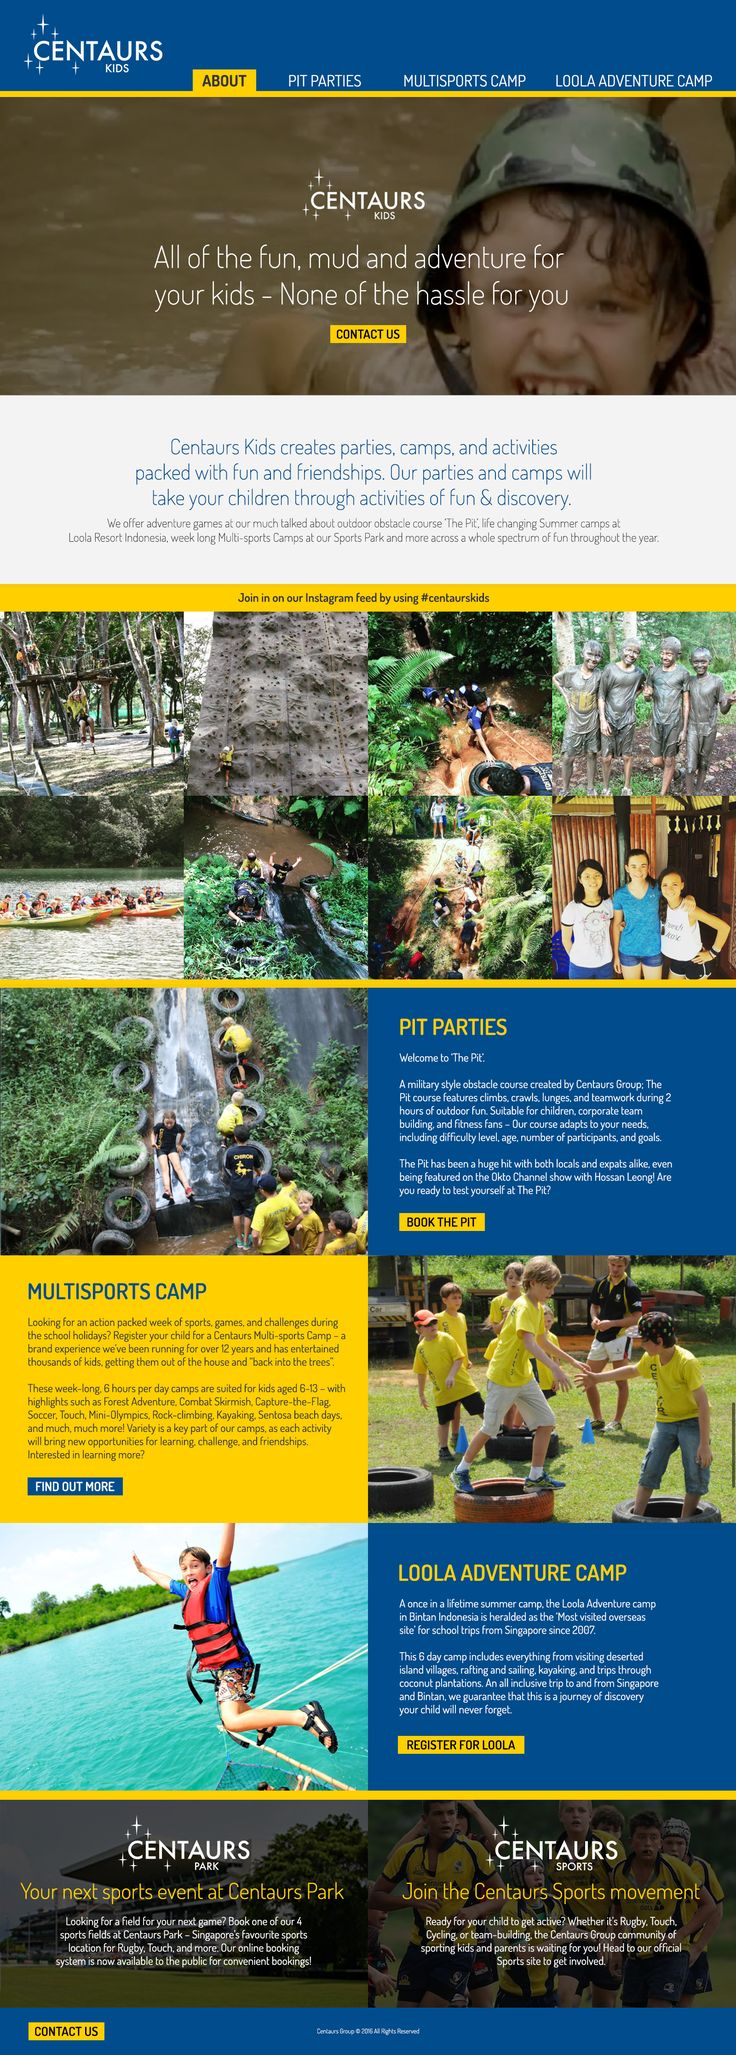 Website design & development for Singapore's pit parties and camp venue, Centaurs Kids